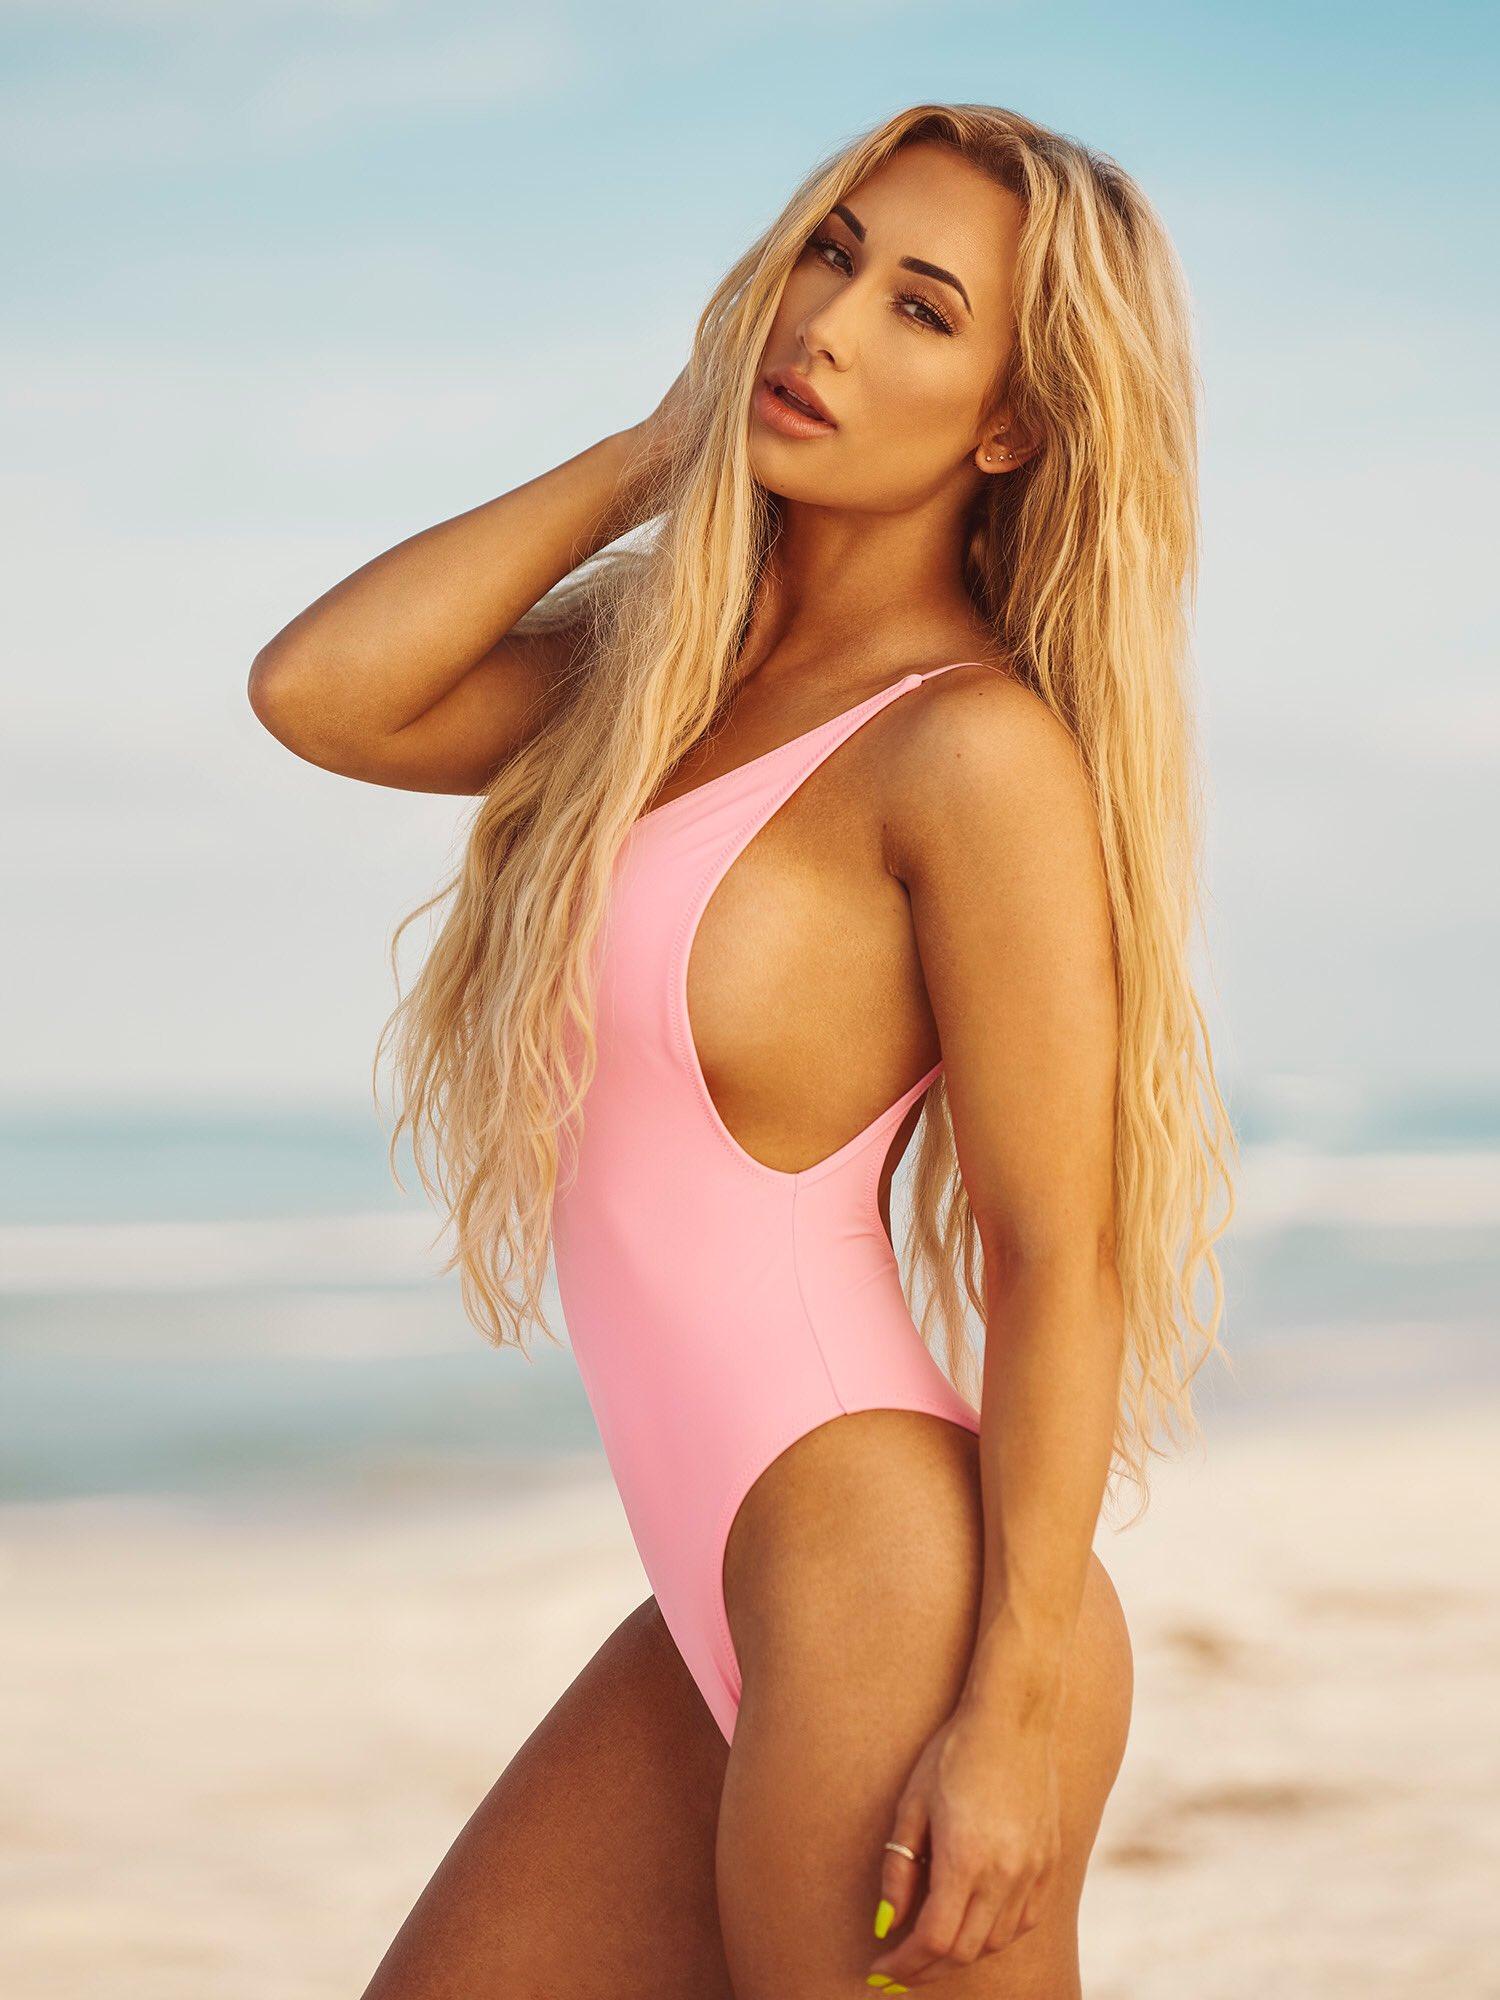 Carmella hot pic